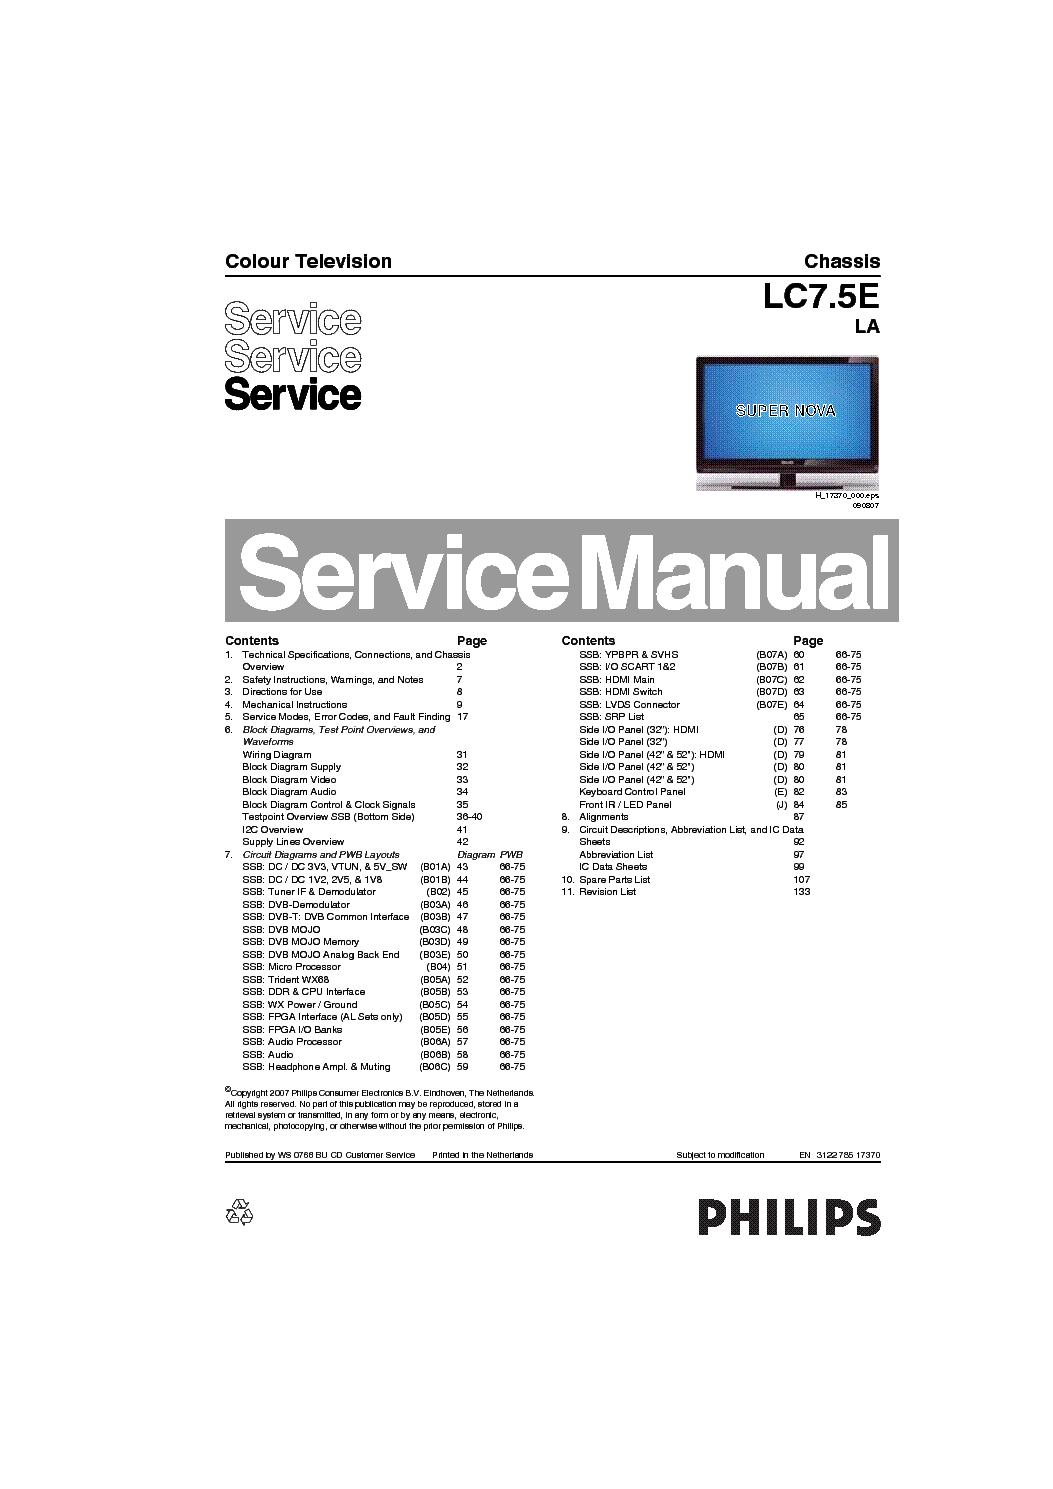 PHILIPS LC7.5ELA 312278517370 Service Manual download